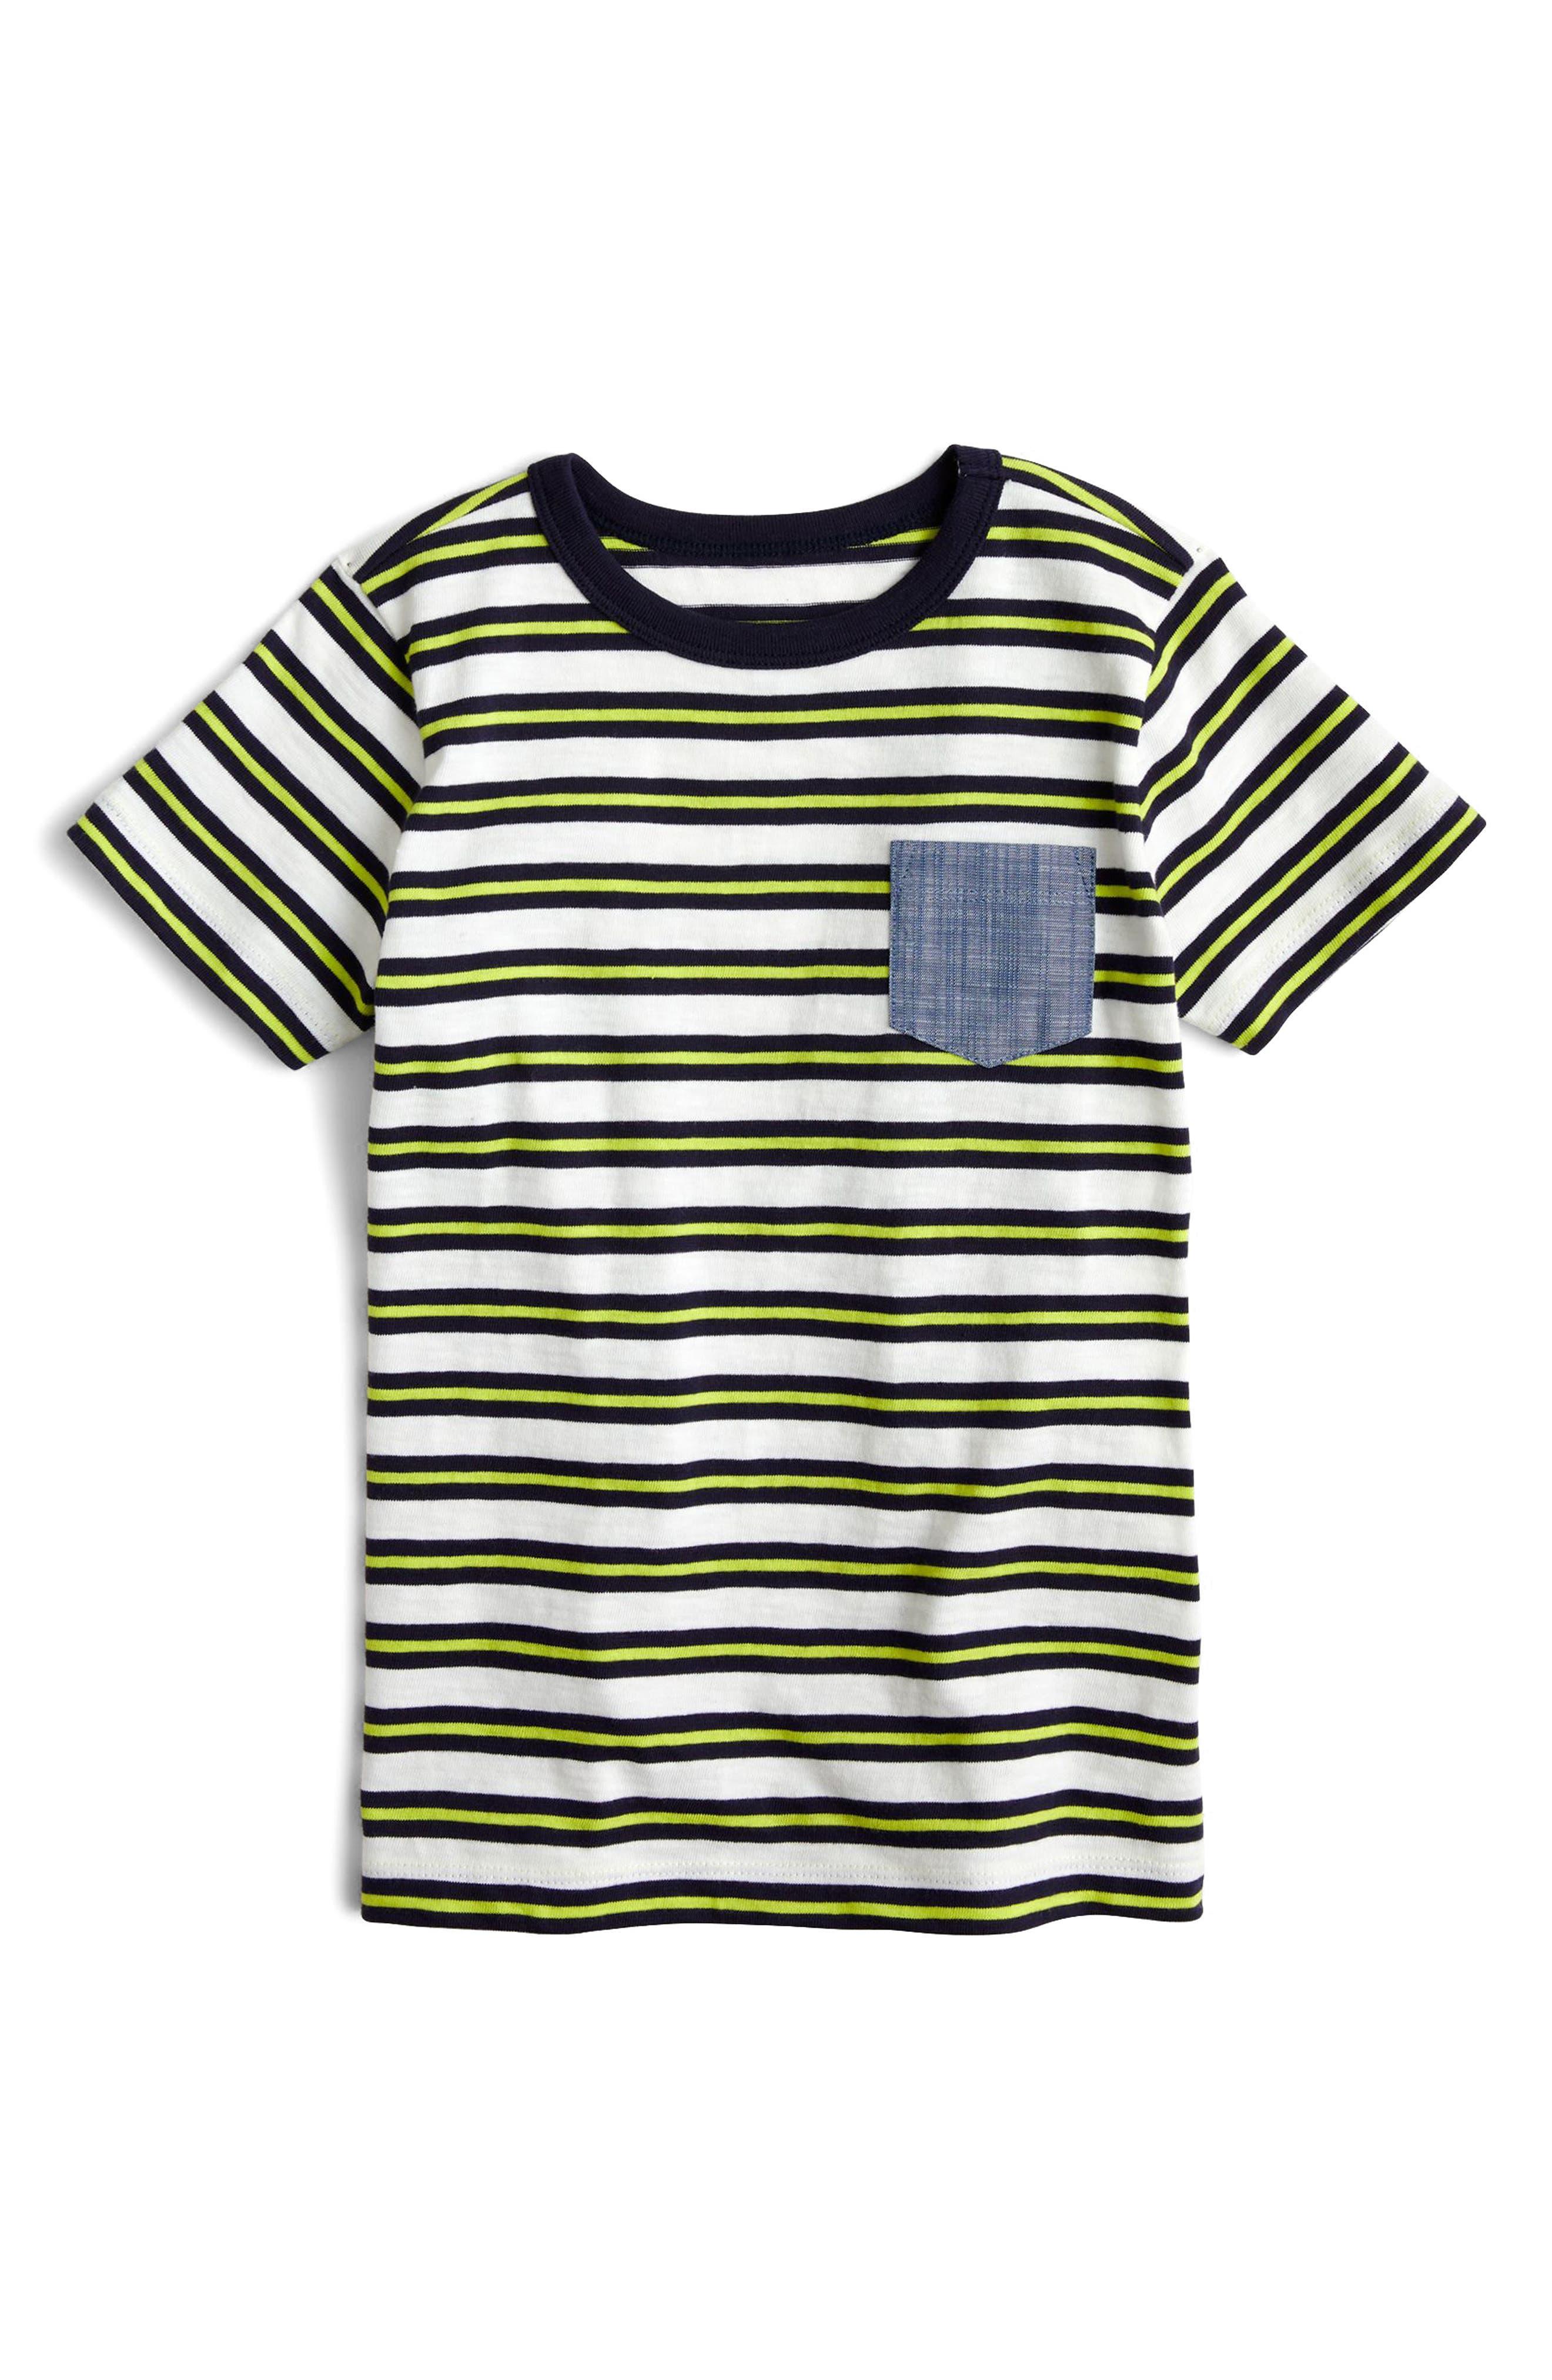 crewcuts by J.Crew Stripe Chambray Pocket T-Shirt (Toddler Boys, Little Boys & Big Boys)